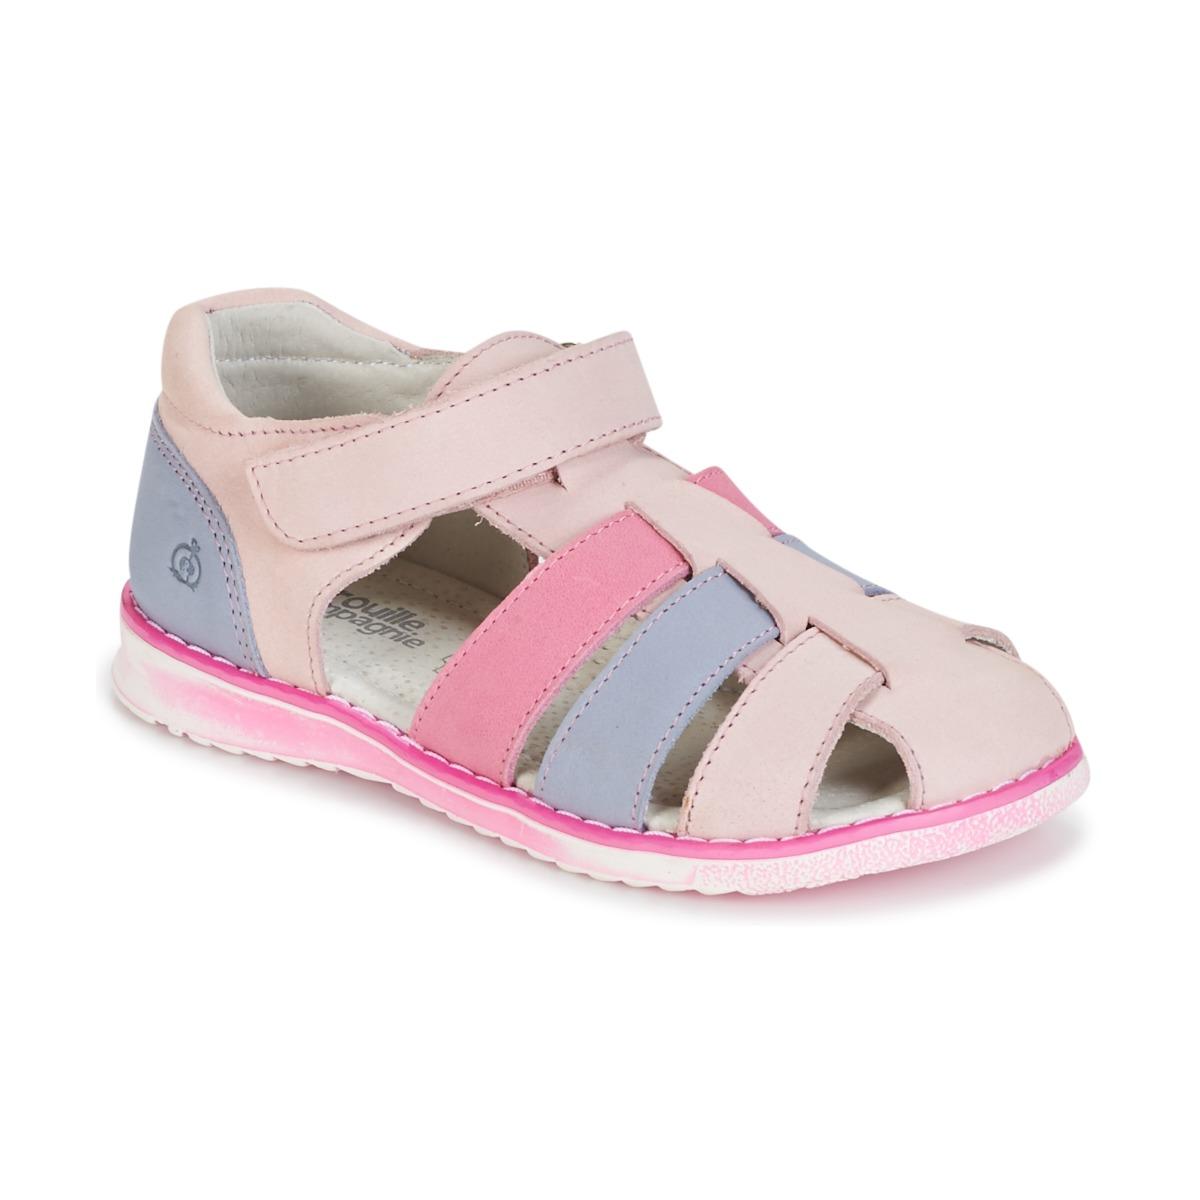 sandaler Citrouille et Compagnie FRINOUI Pink / Blå / LYS / Fuchsia